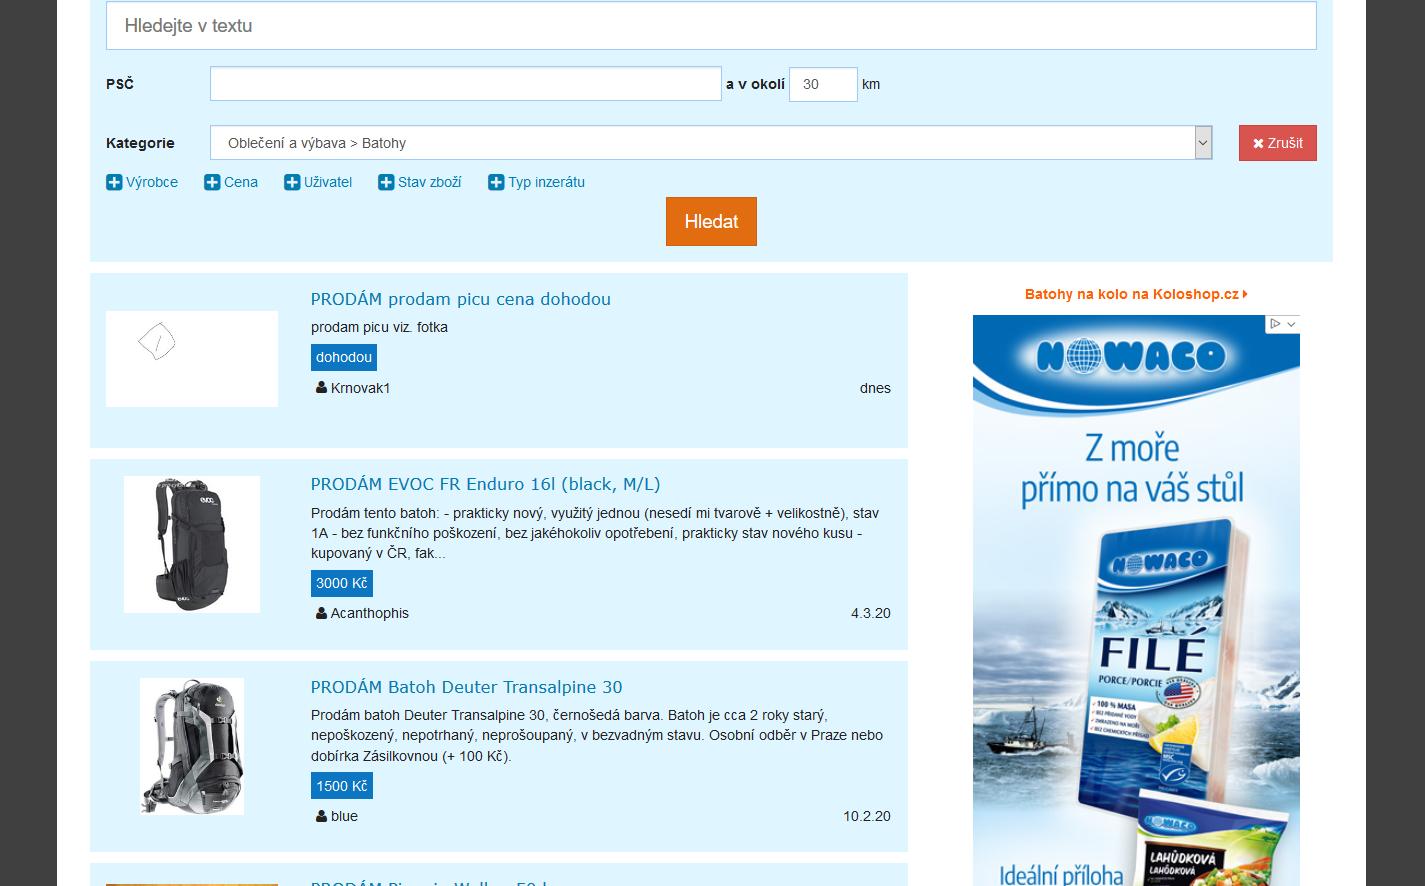 https://www.kempy-chaty.cz/sites/default/files/turistika/prodej_batohu_pica.png